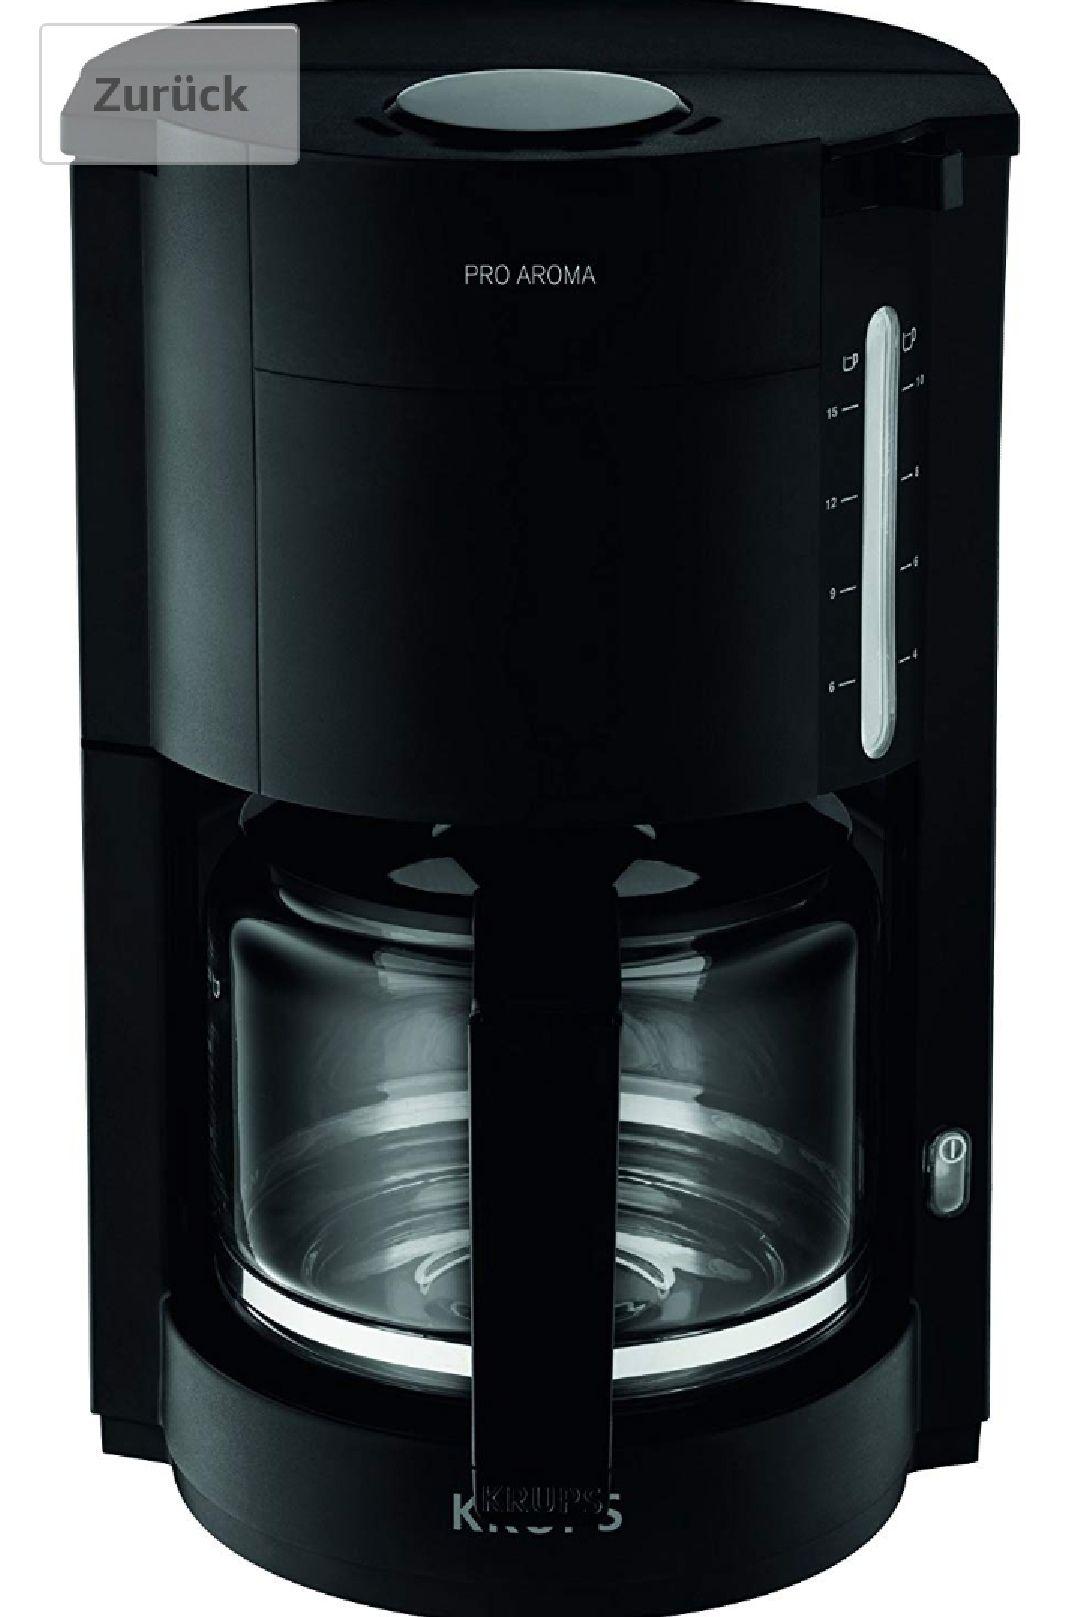 KRUPS ProAroma F30908 Kaffeemaschine Filterkaffee